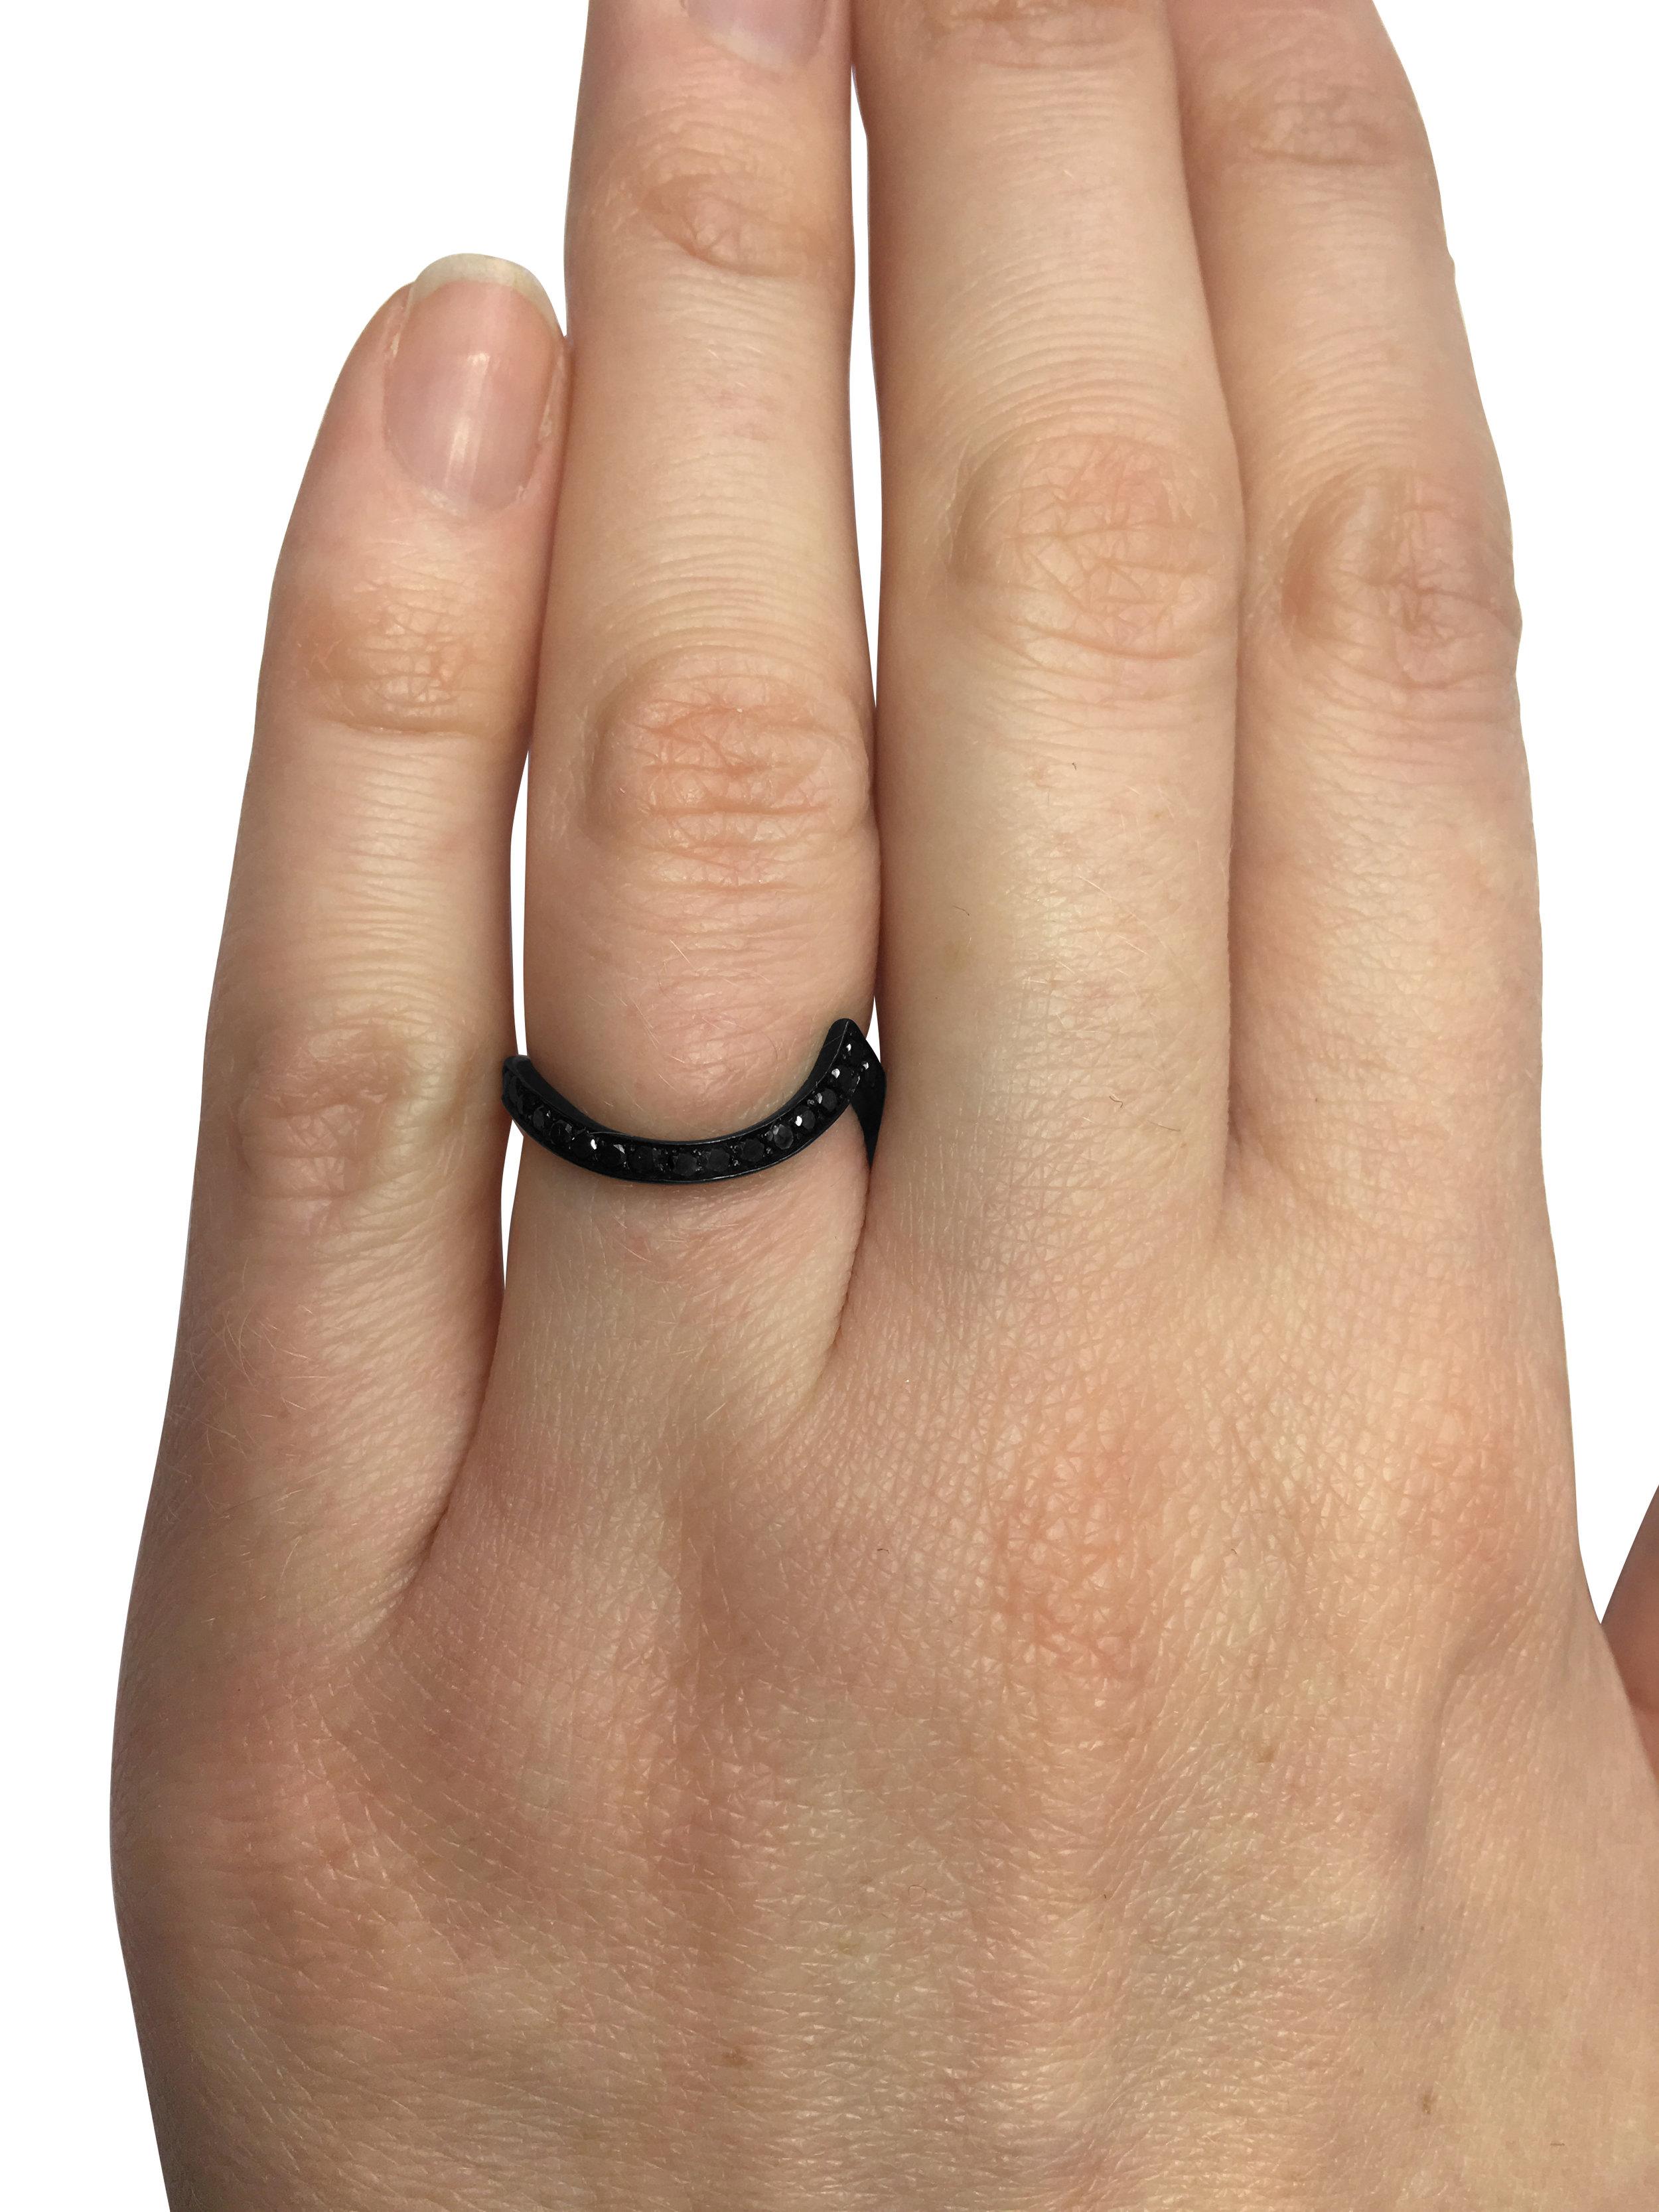 18ct-white-gold-black-rhodium-plated-black-diamond-fitted-wedding-ring-4.jpg